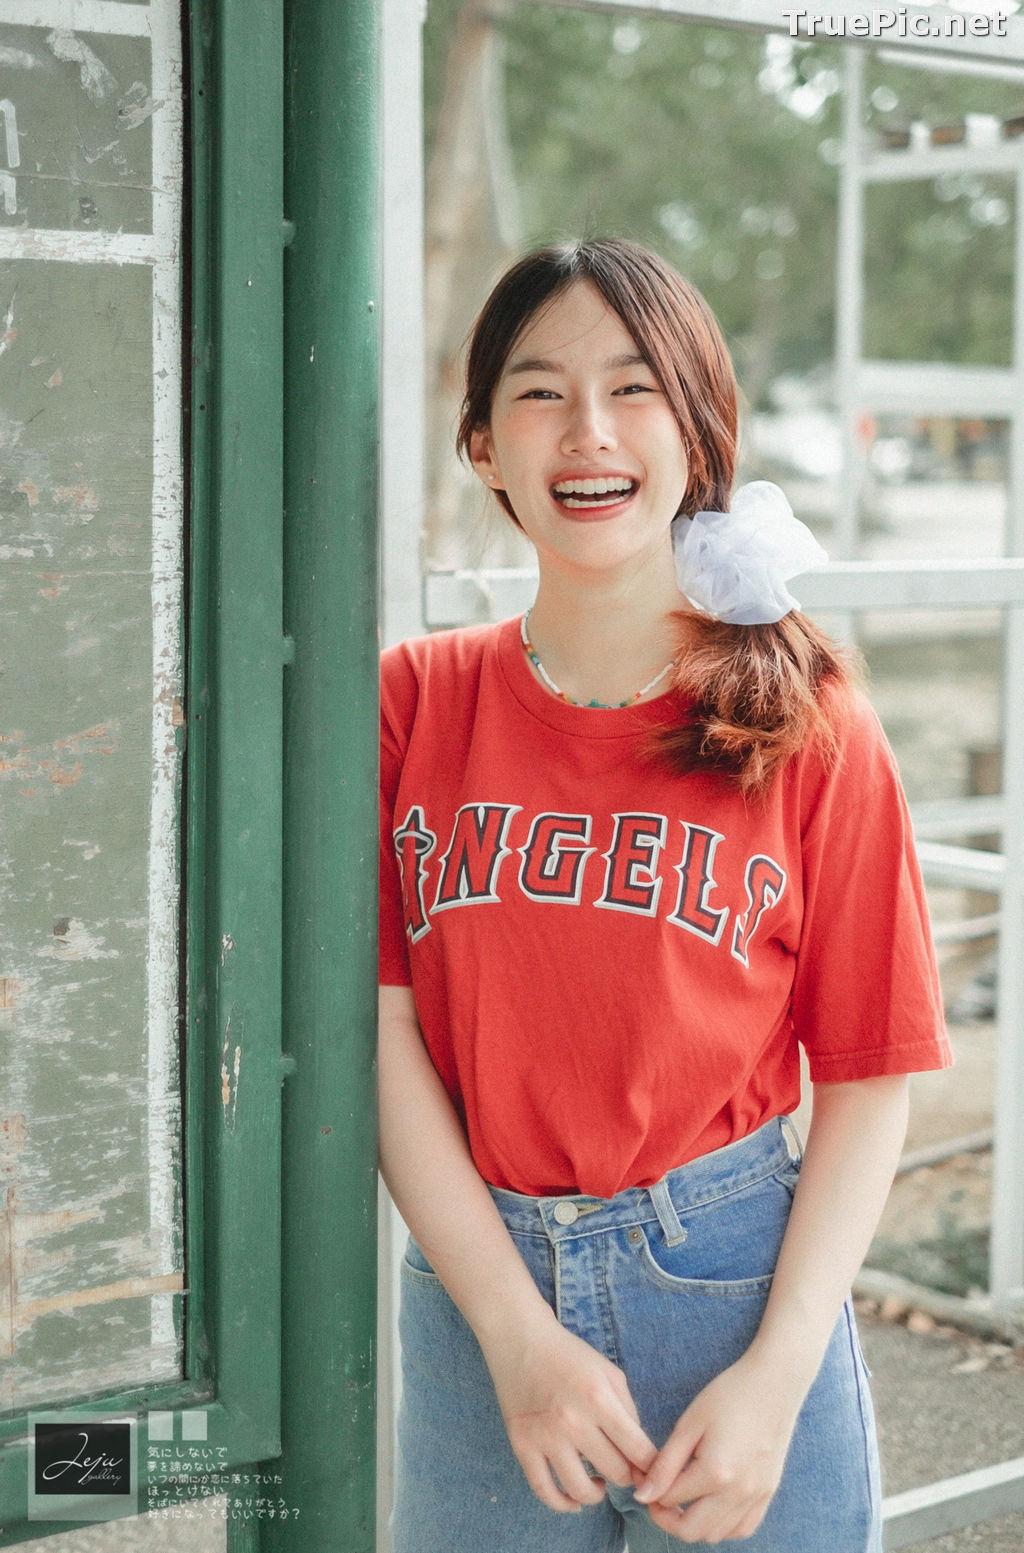 Image Thailand Cute Model - Fahfab Thunchanok - Red Angels - TruePic.net - Picture-3